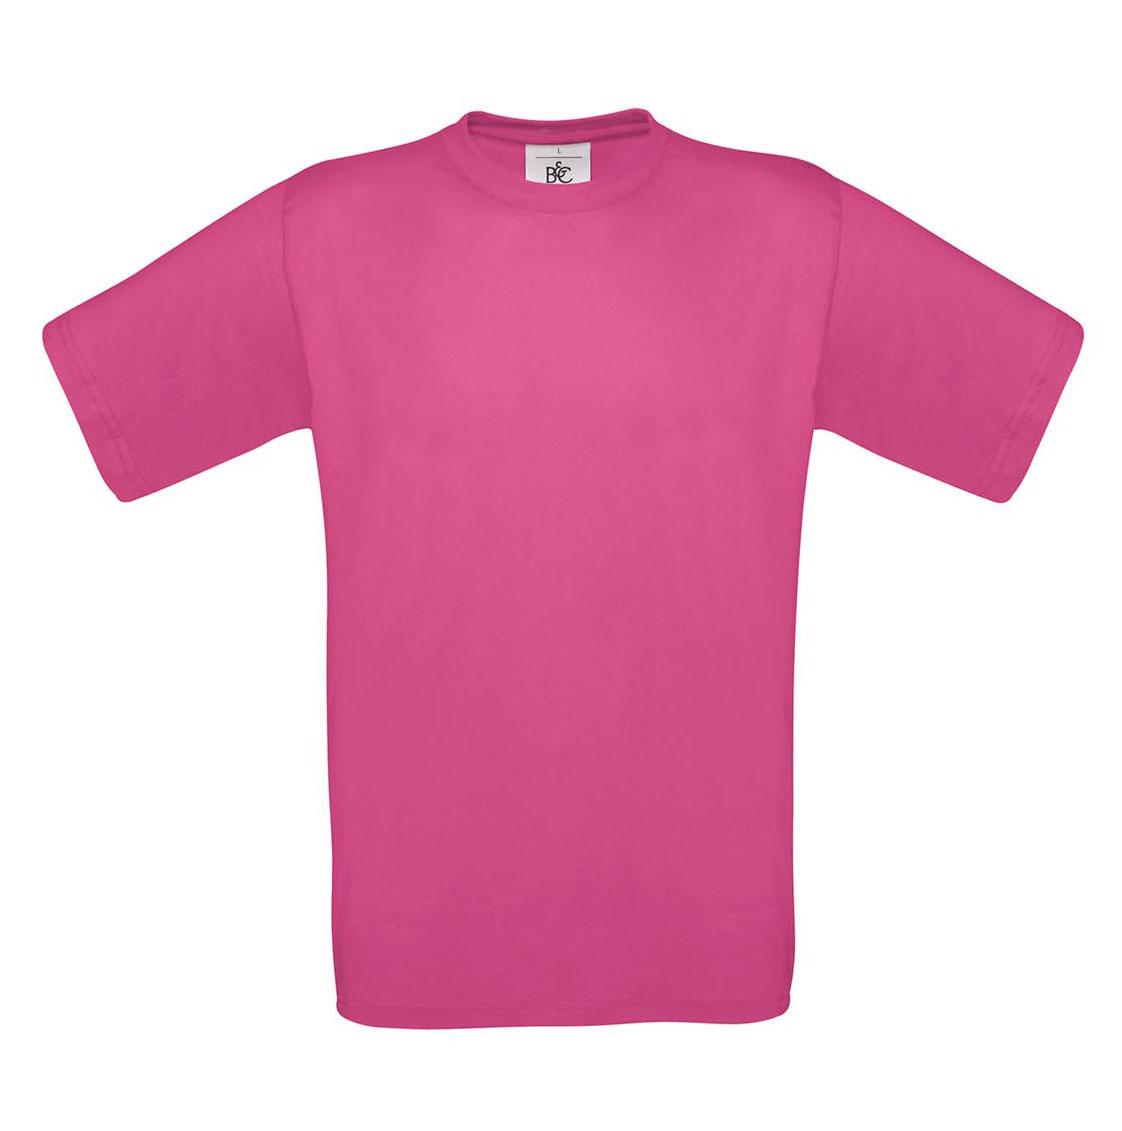 T-shirt ανδρικό B and C No 2 - Φούξια (TU002)